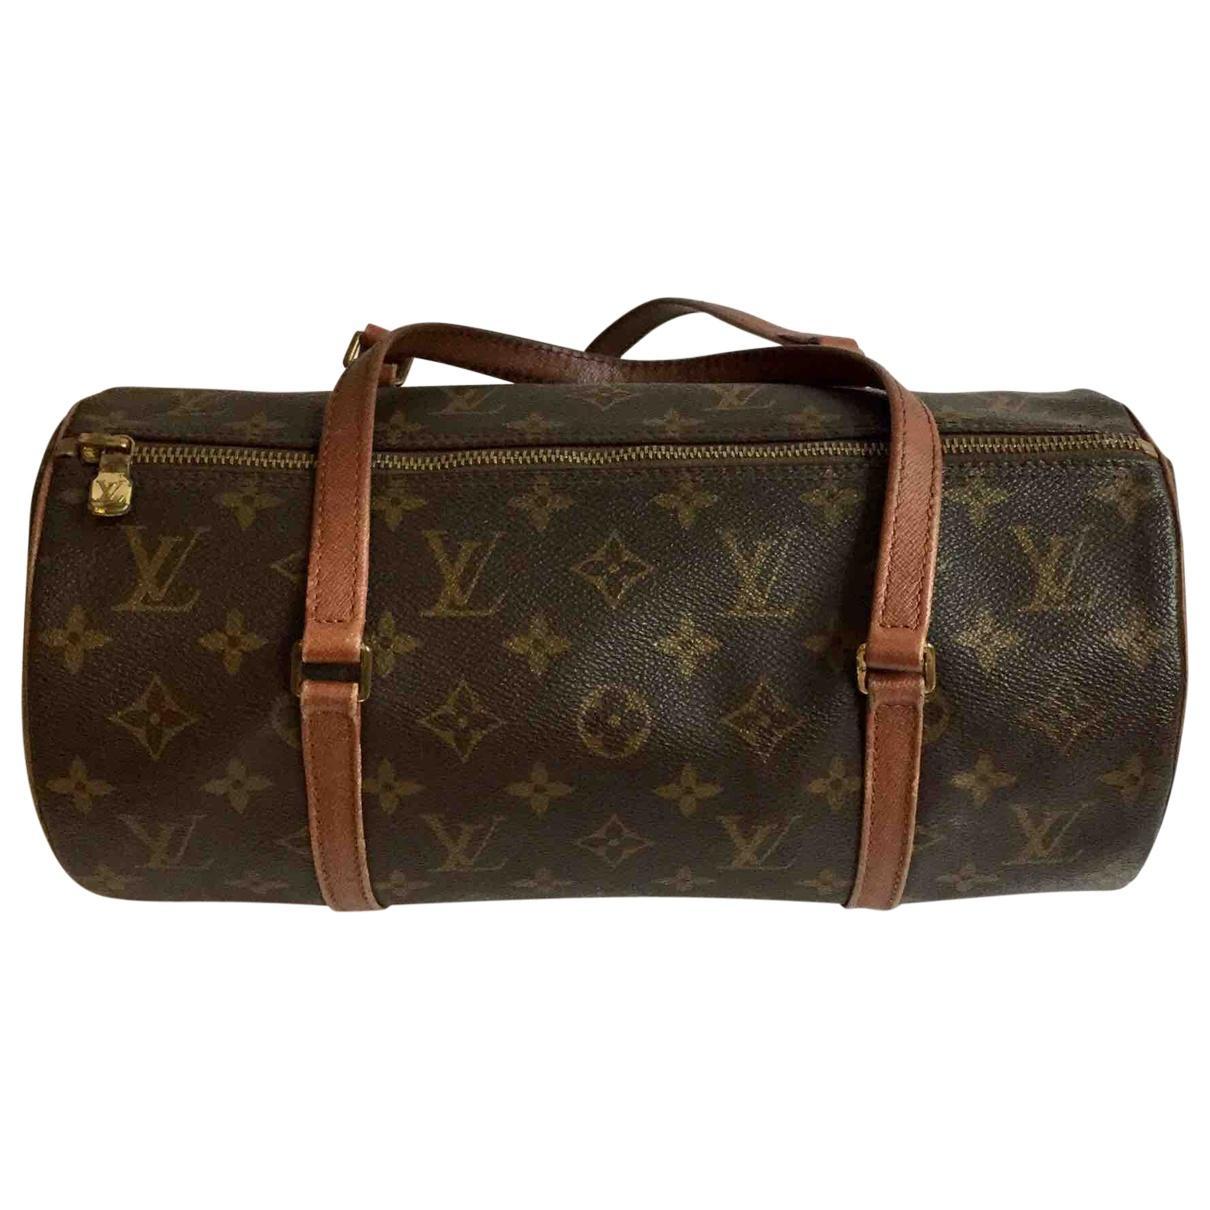 V° 73 Pre-owned - Handbag nK5YK3